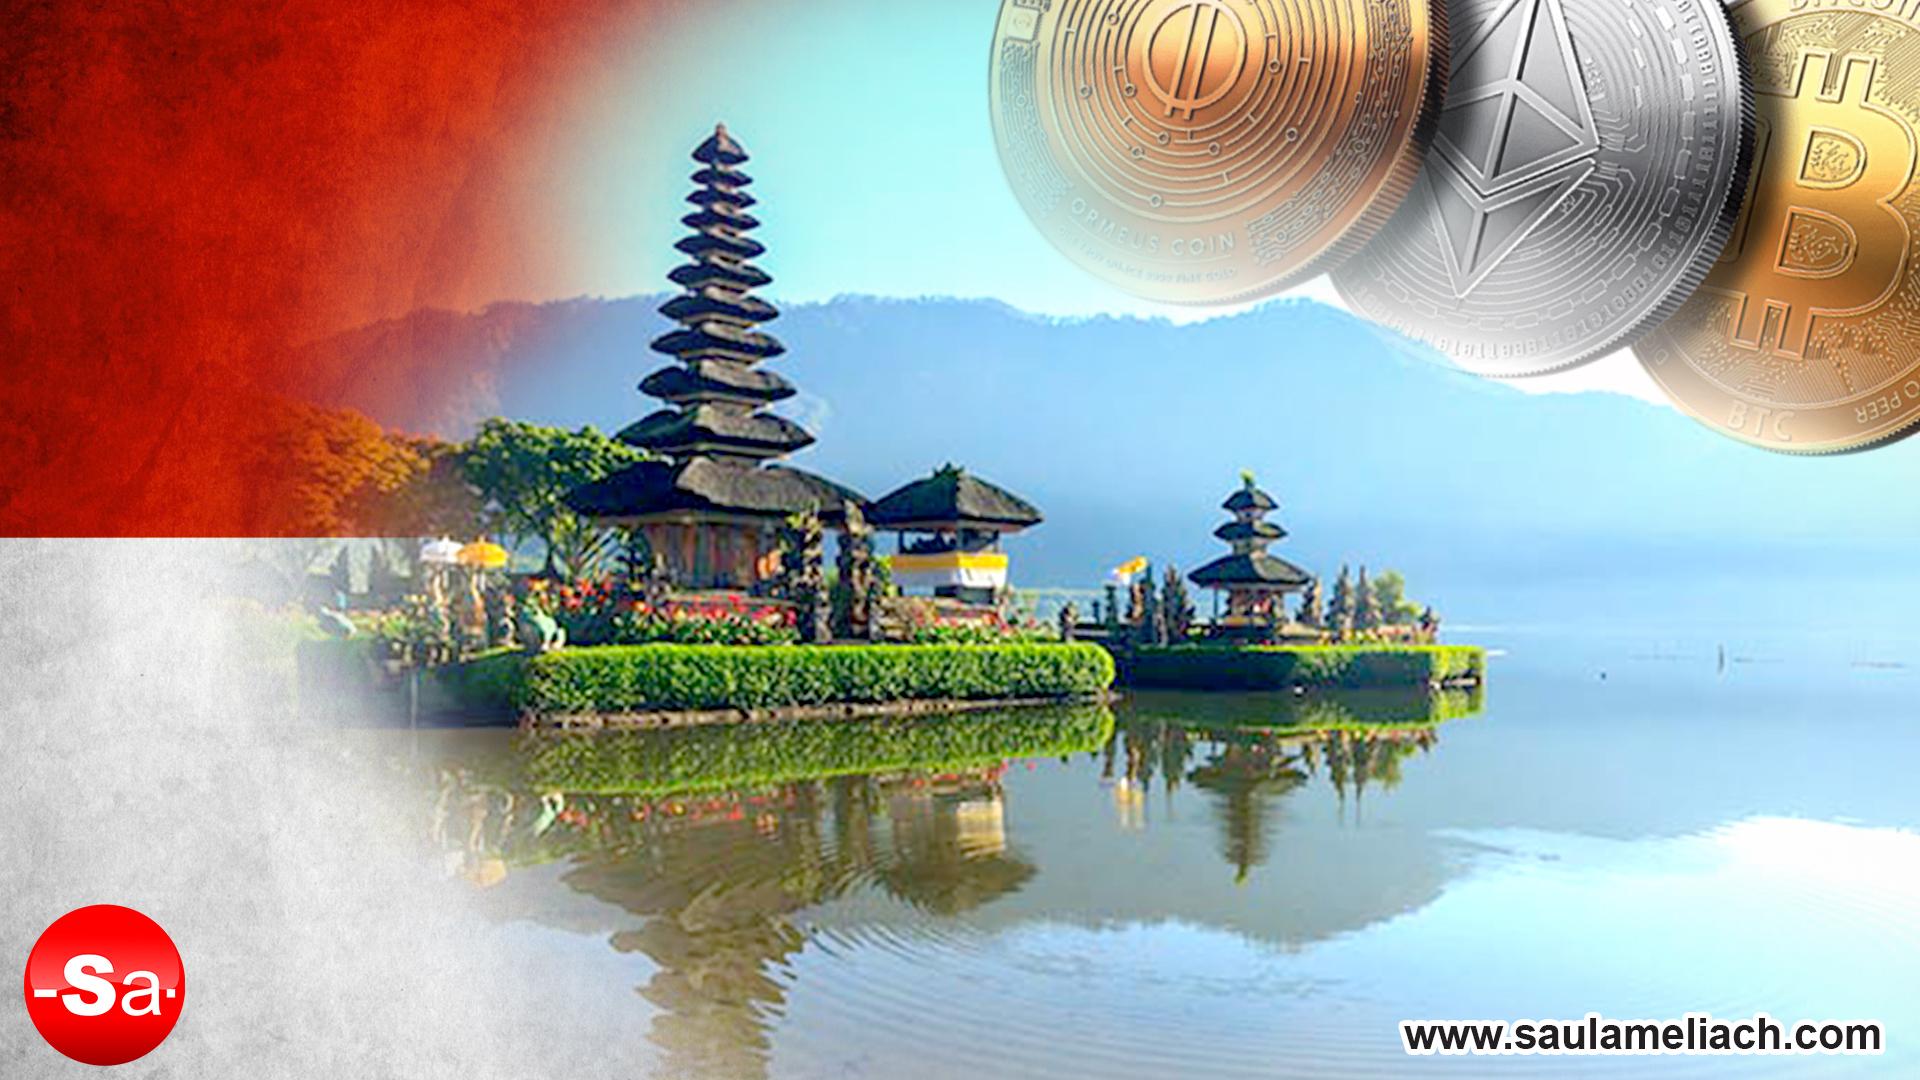 saul ameliach - indonesia - financieros